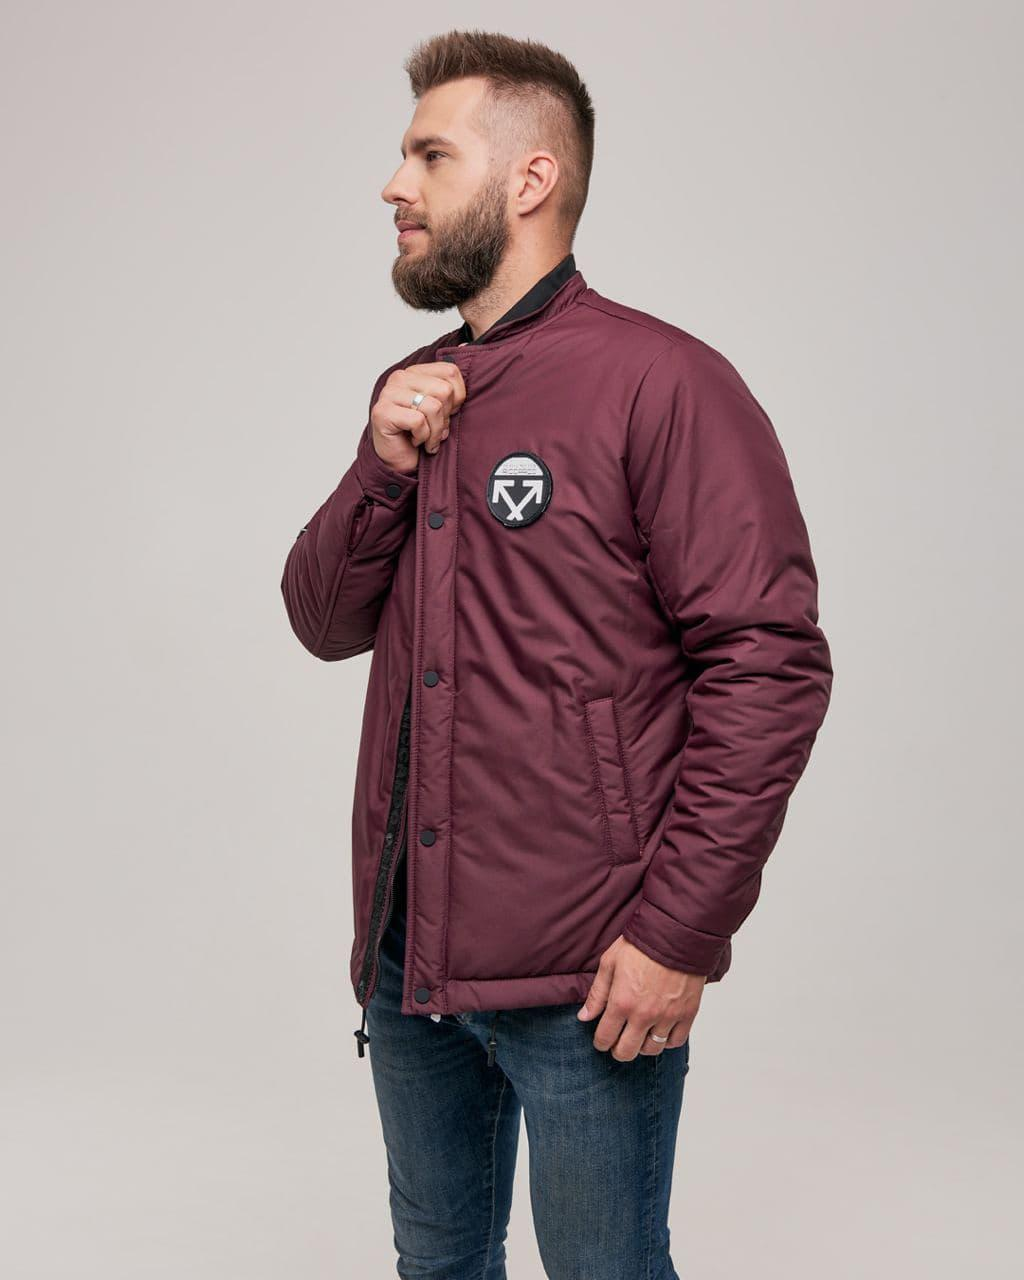 Стильная мужская зимняя куртка. Цвет бордо. Размер 46(S), 48(M), 50(L), 52(XL), 54(XXL)